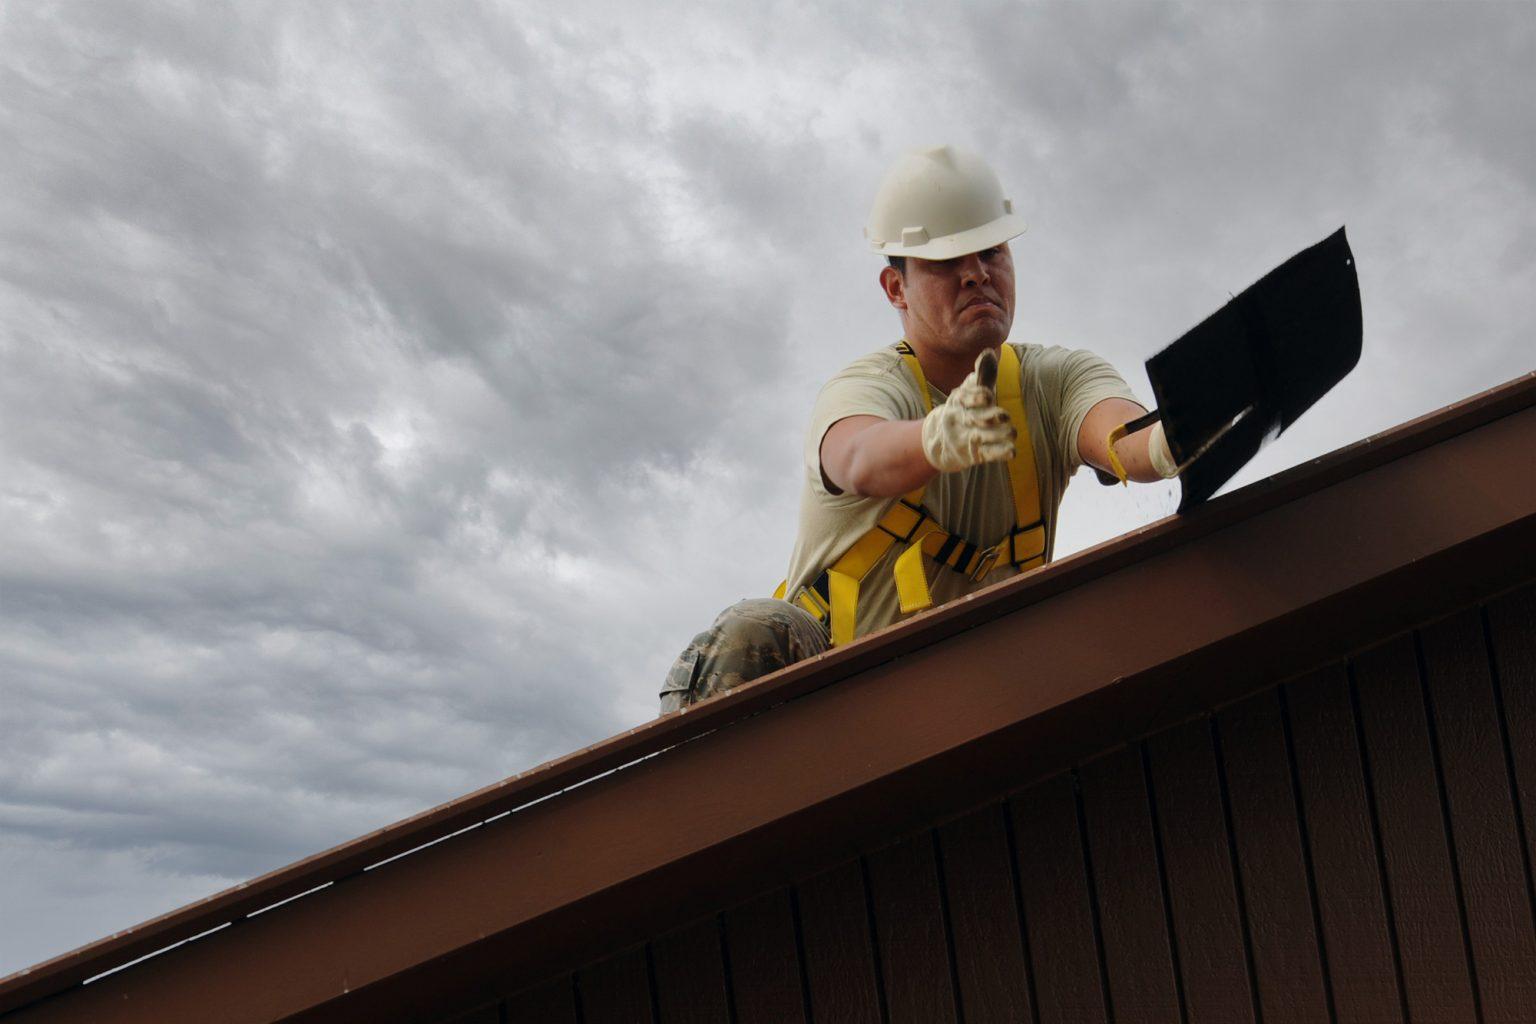 6 factors that determine your roof's lifespan